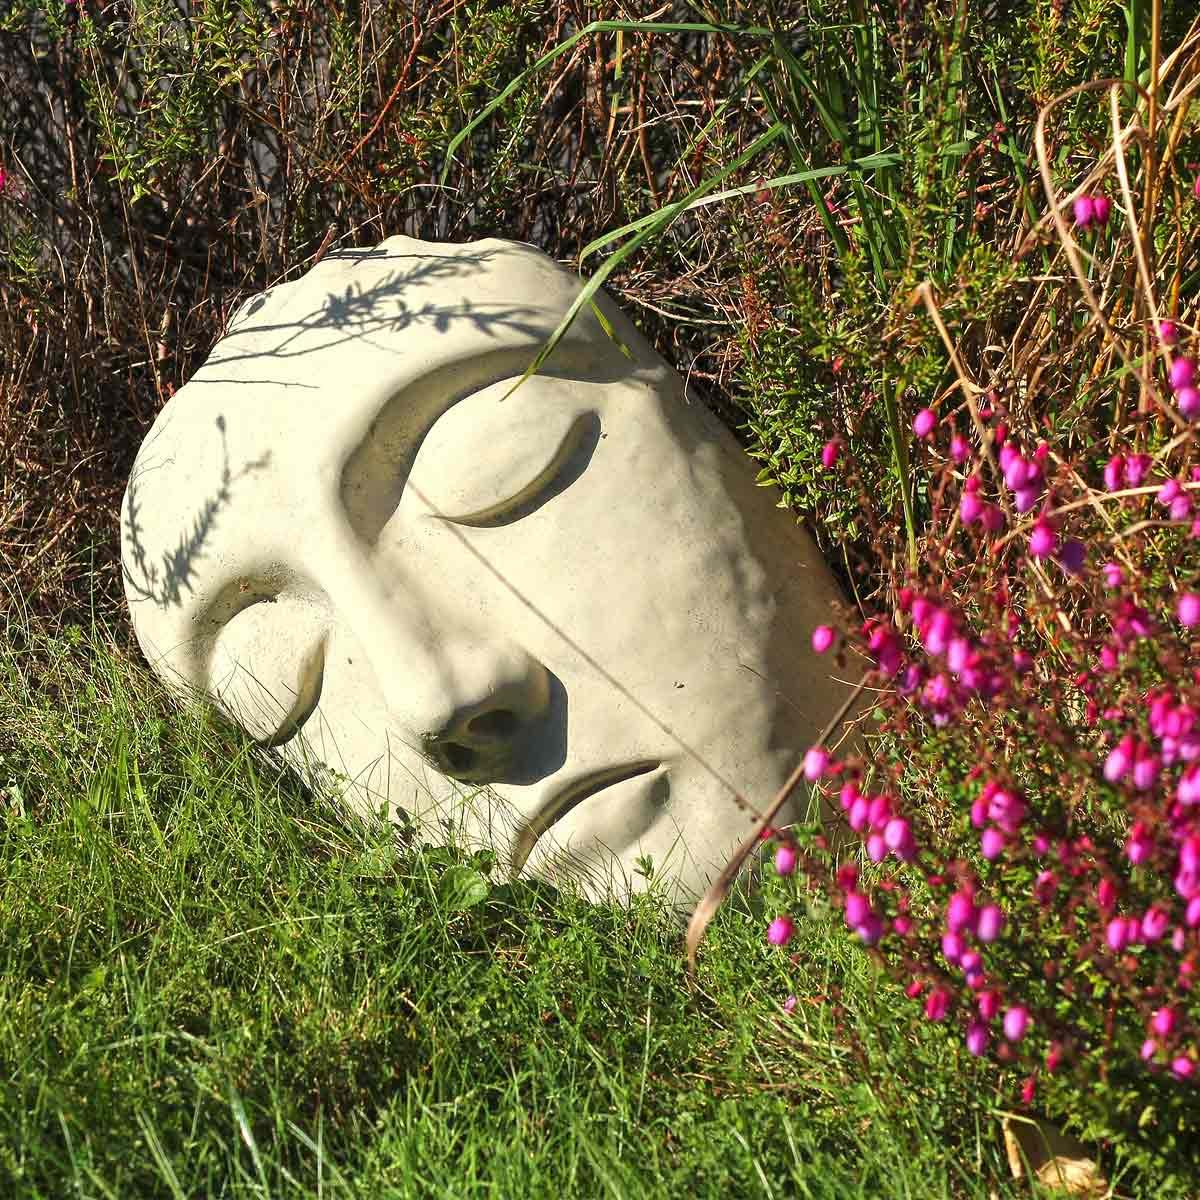 Figurines décoratives, vente au meilleur prix | jardins-animes.com